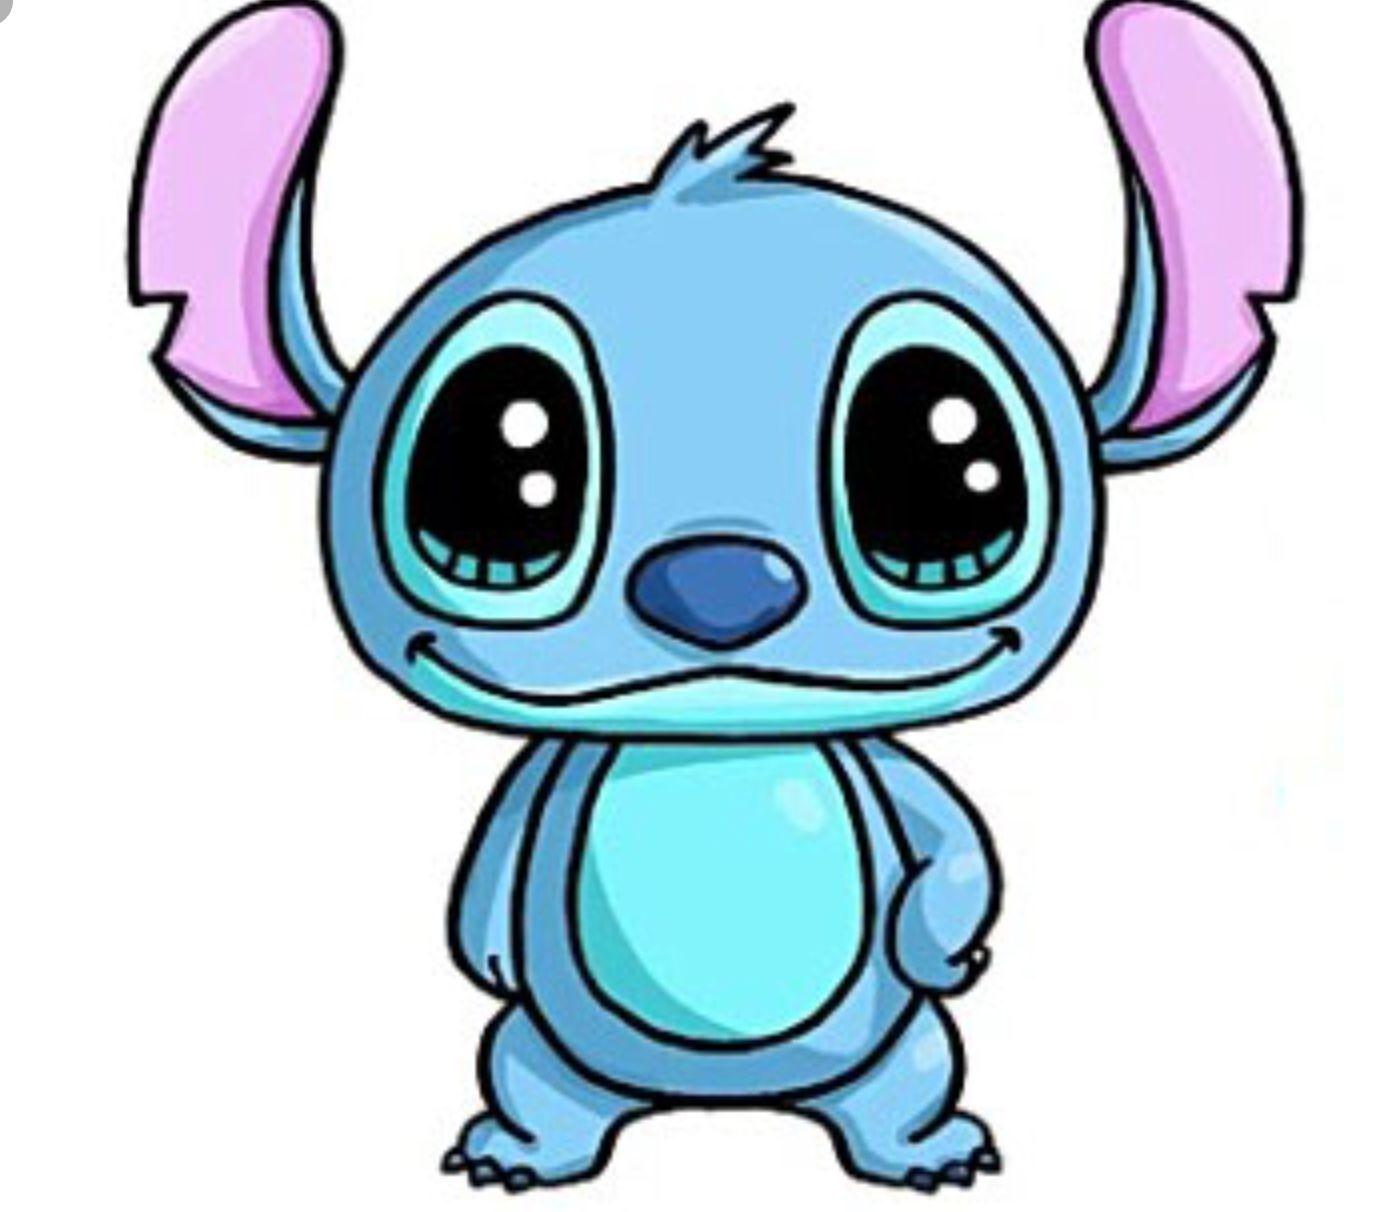 Pin By Elleyah On Stitch Cute Disney Drawings Cute Kawaii